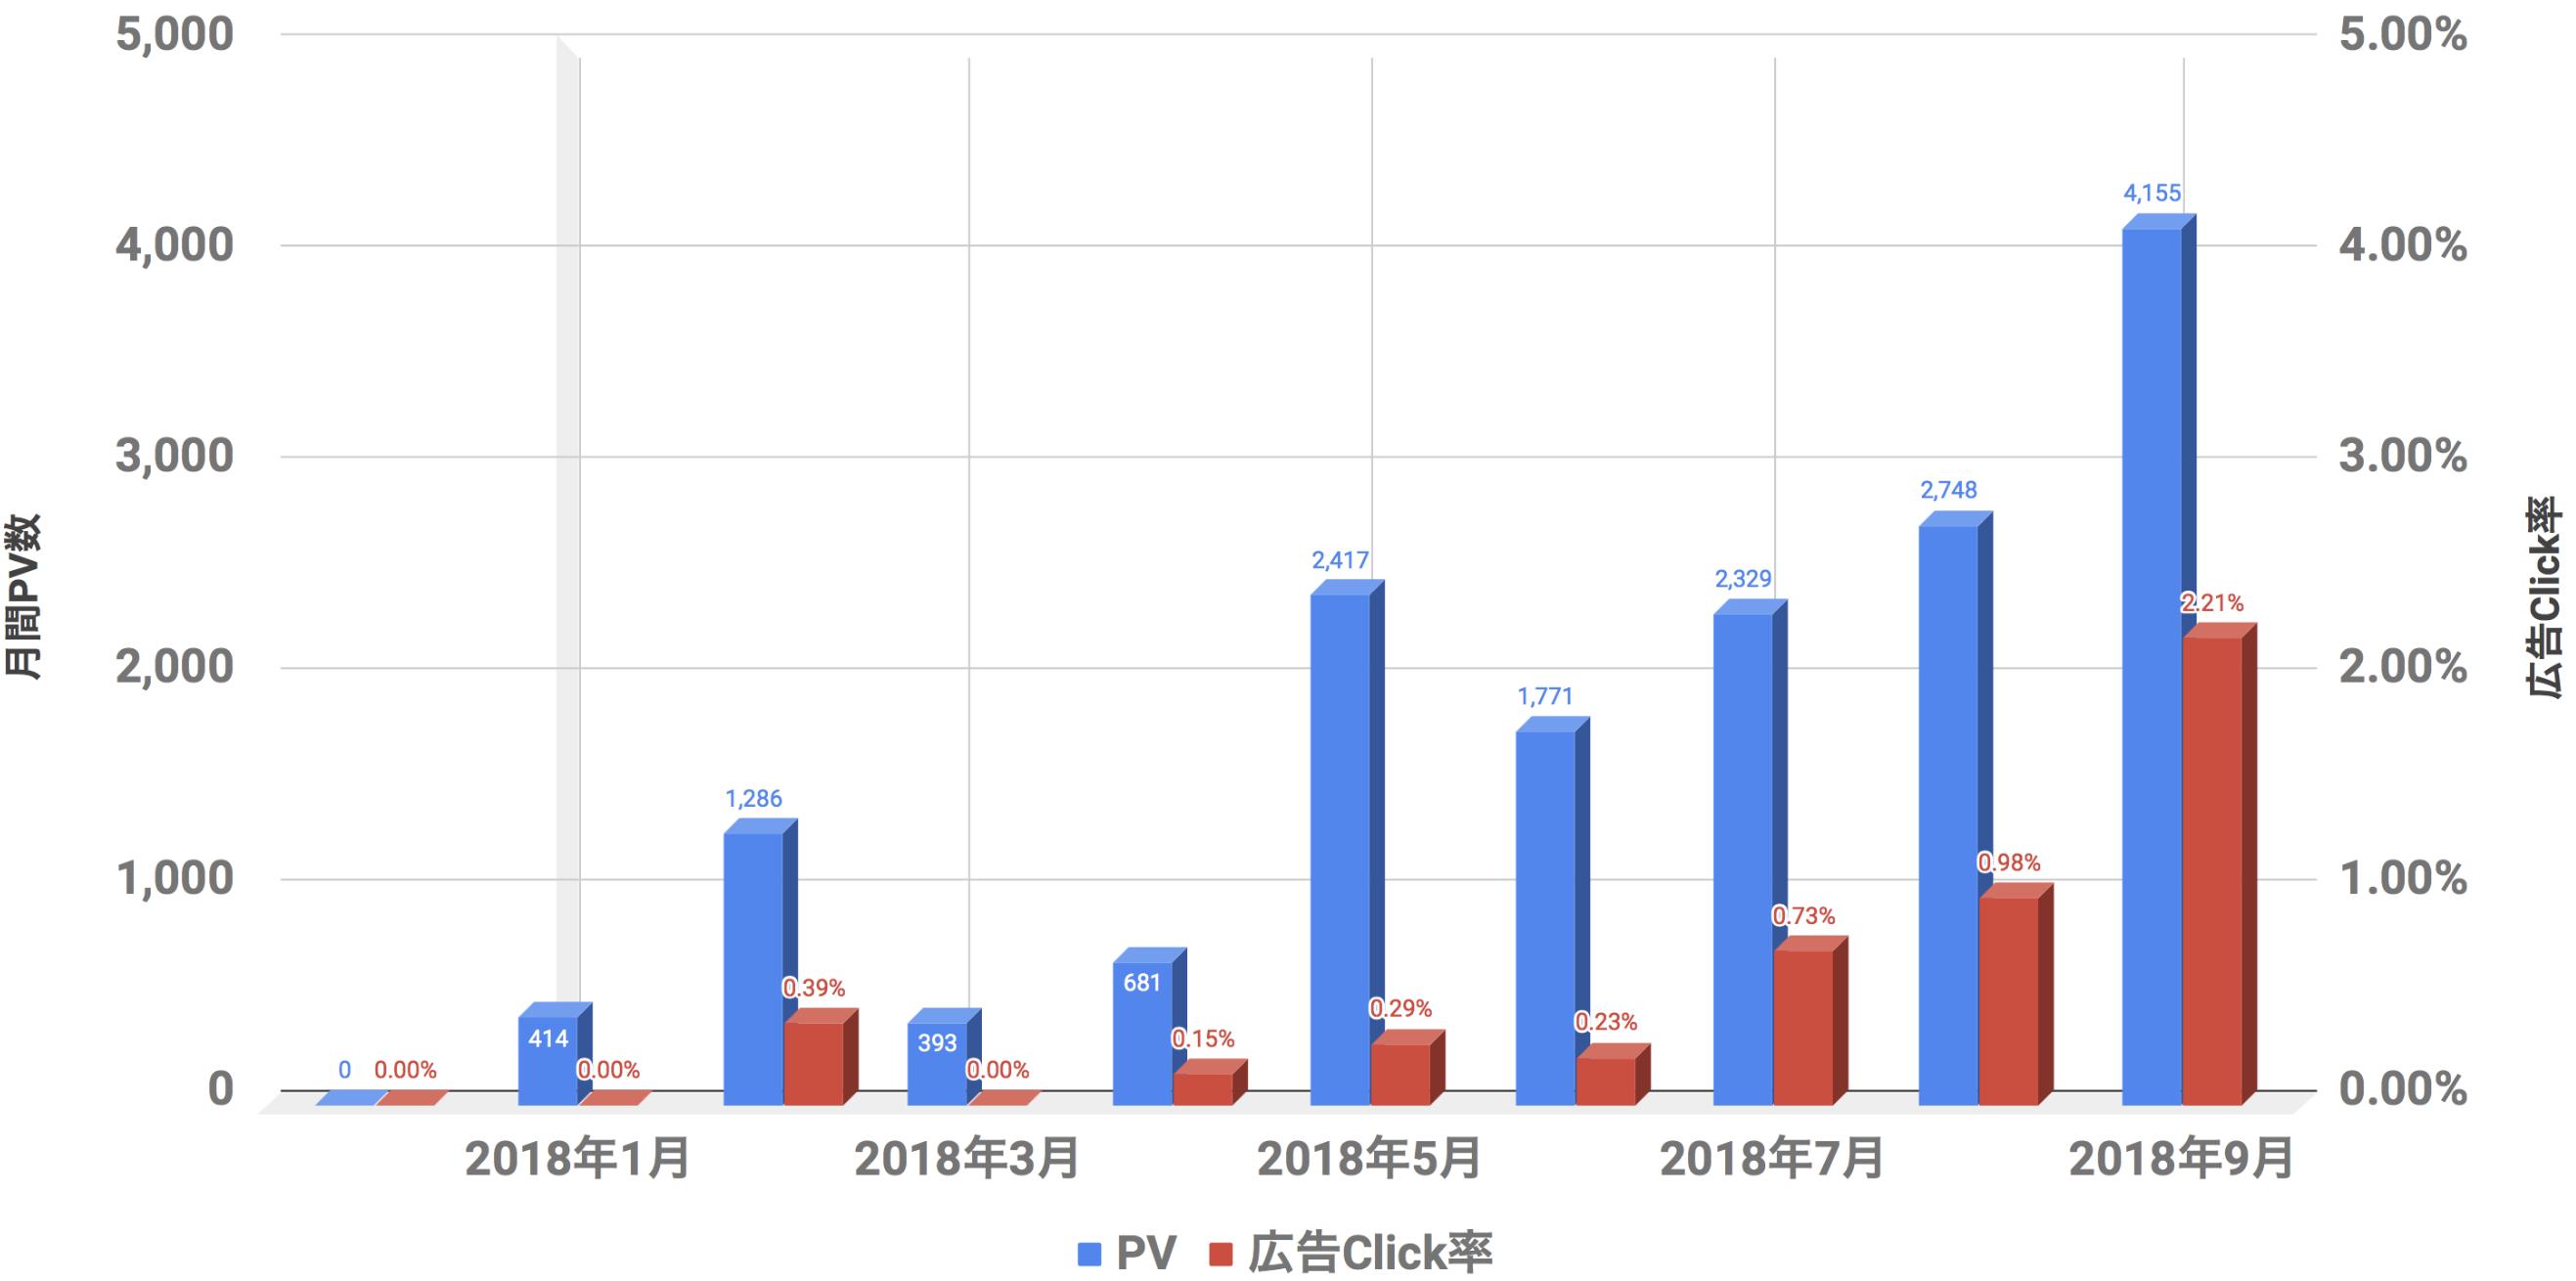 PV,クリック率